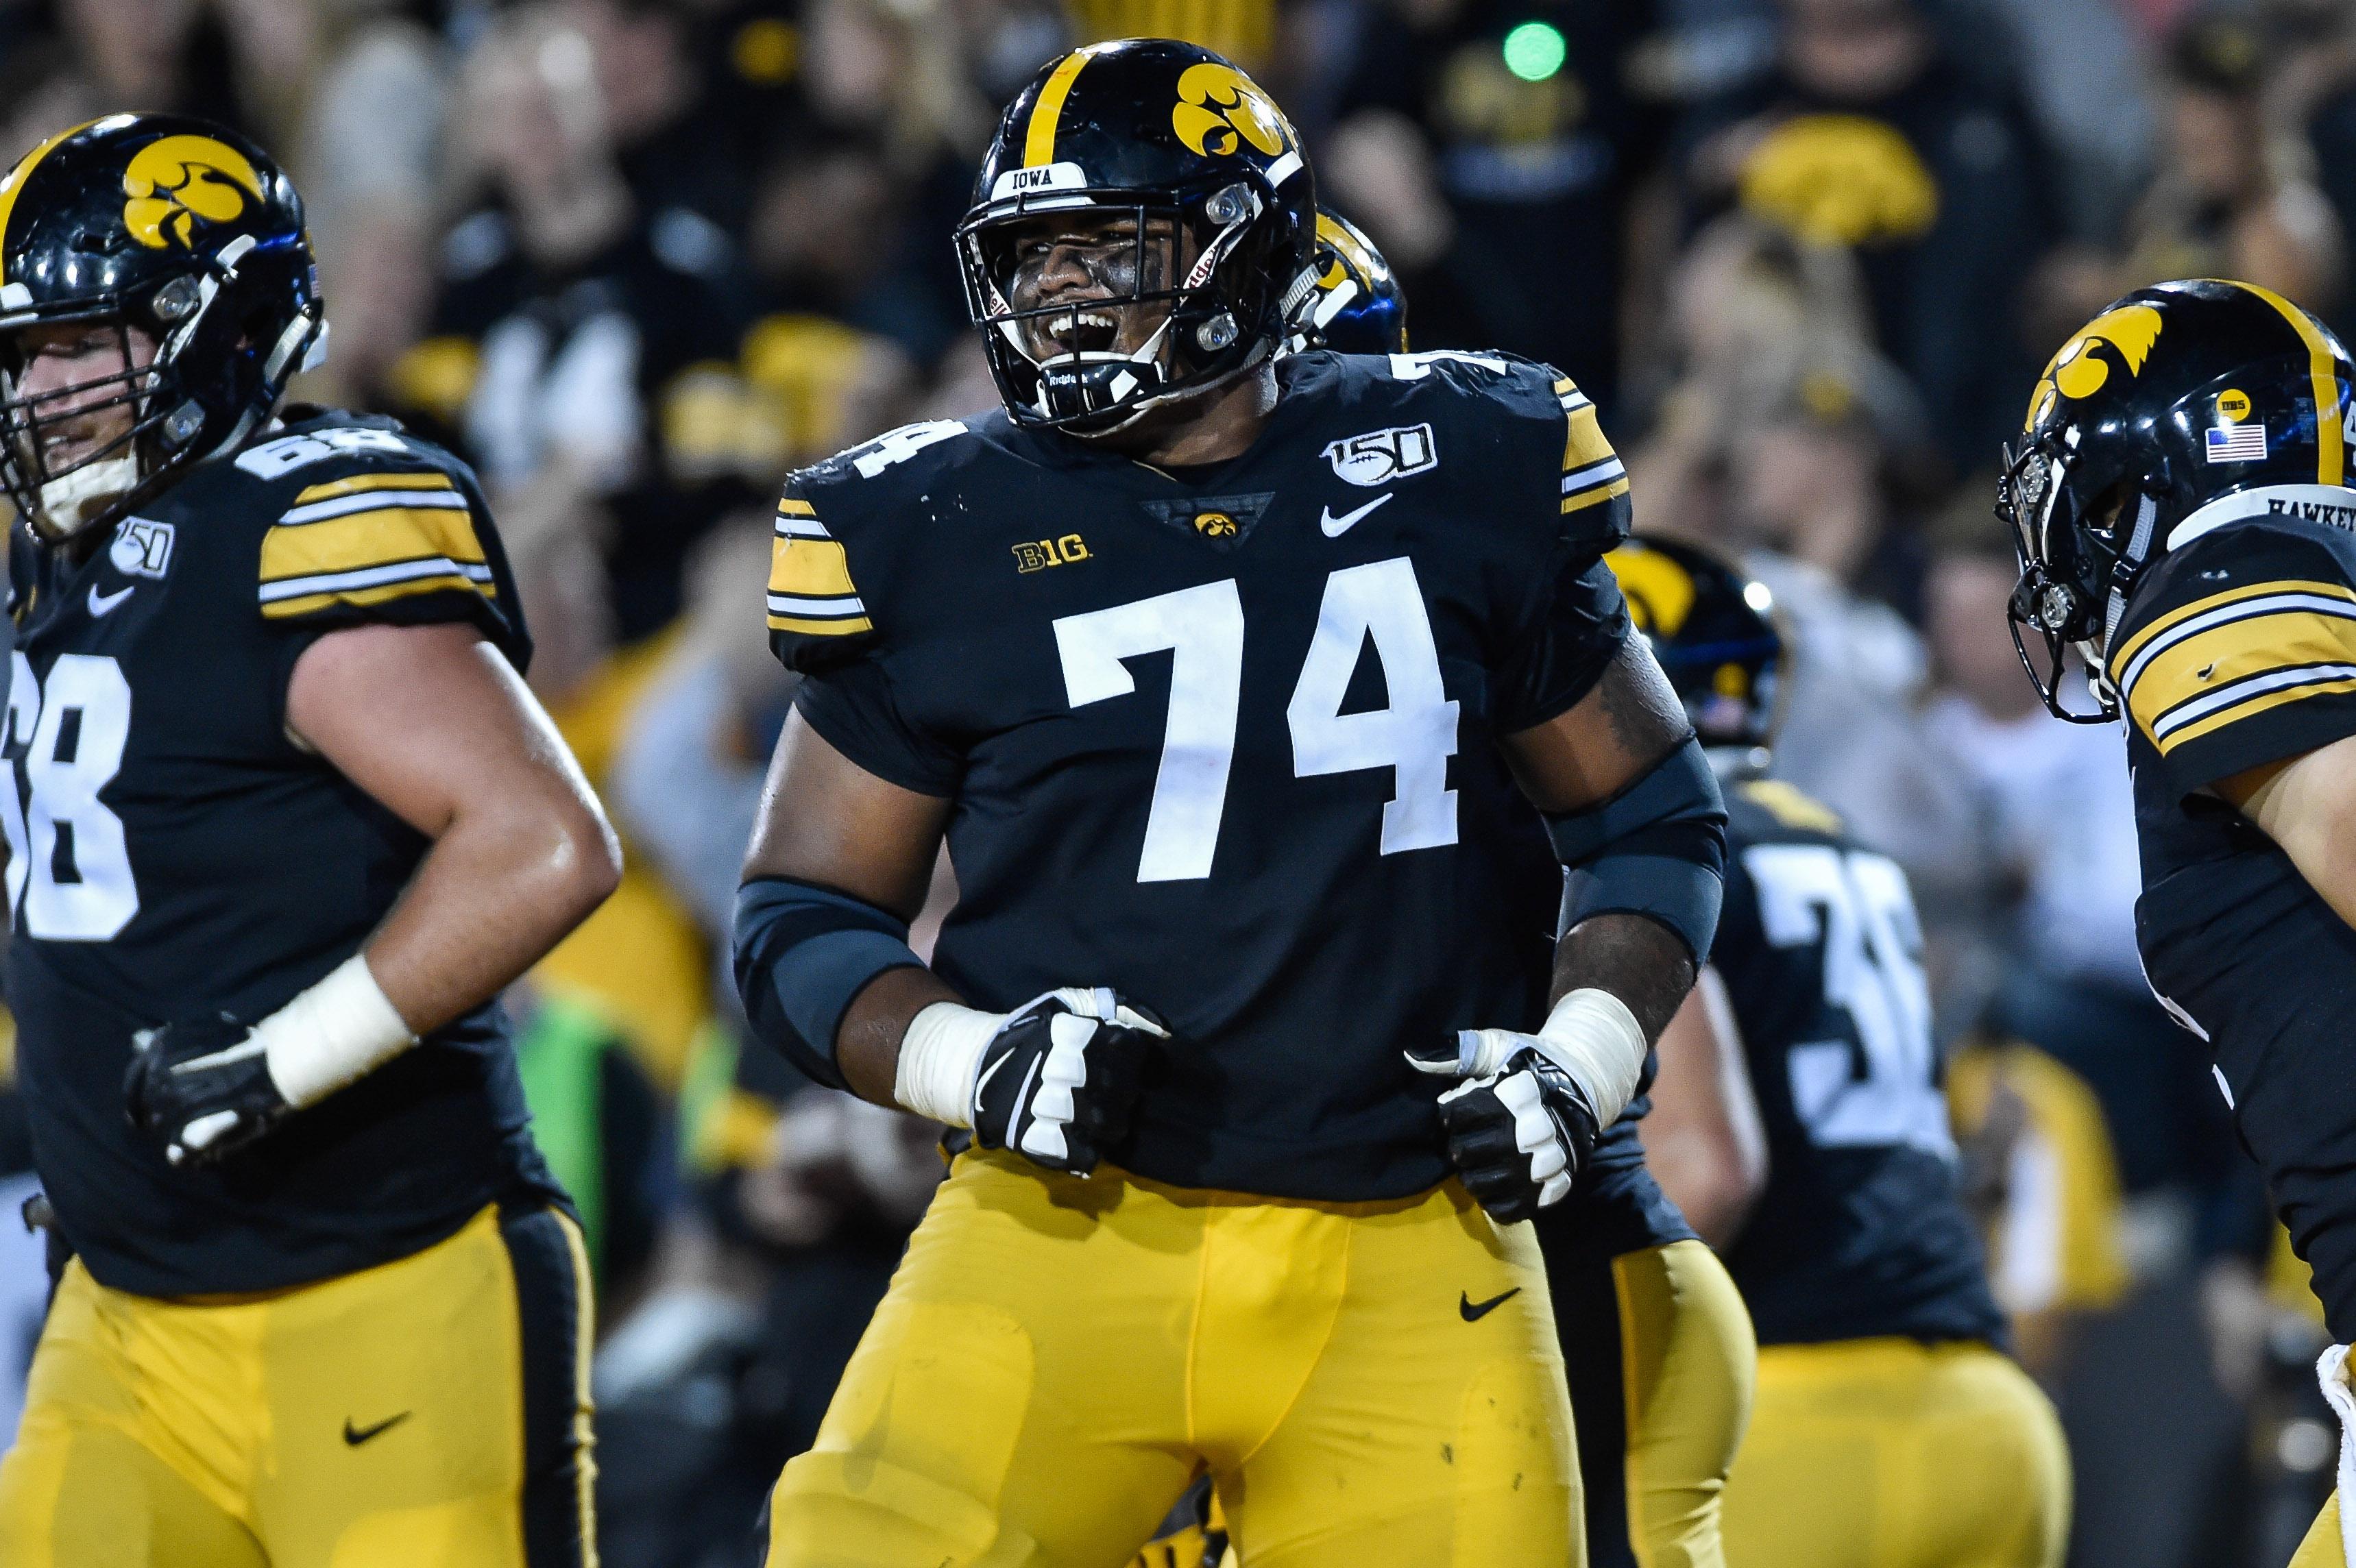 2020 NFL Mock Draft: Trades, QB Picks Among 1st-Round Surprises